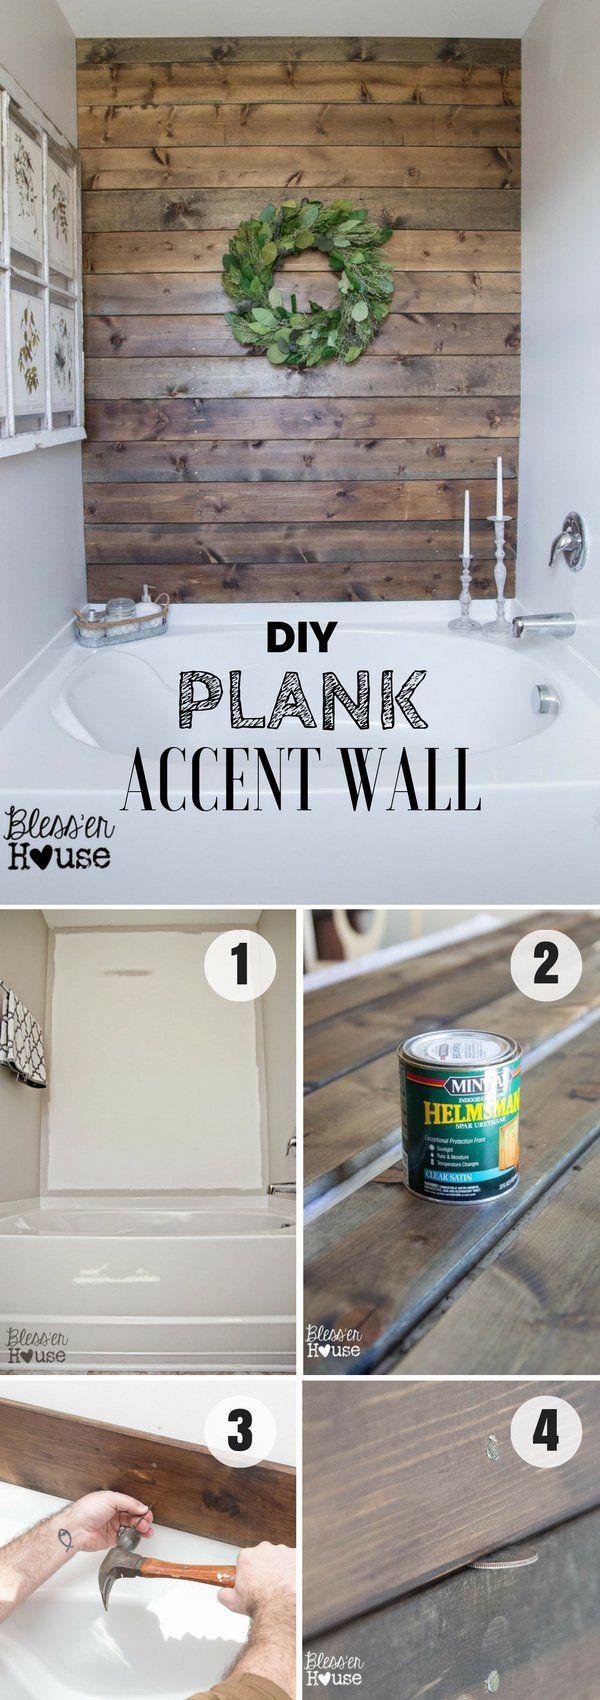 Diy bathroom wall decor ideas  gorgeous diy rustic bathroom decor ideas you should try at home